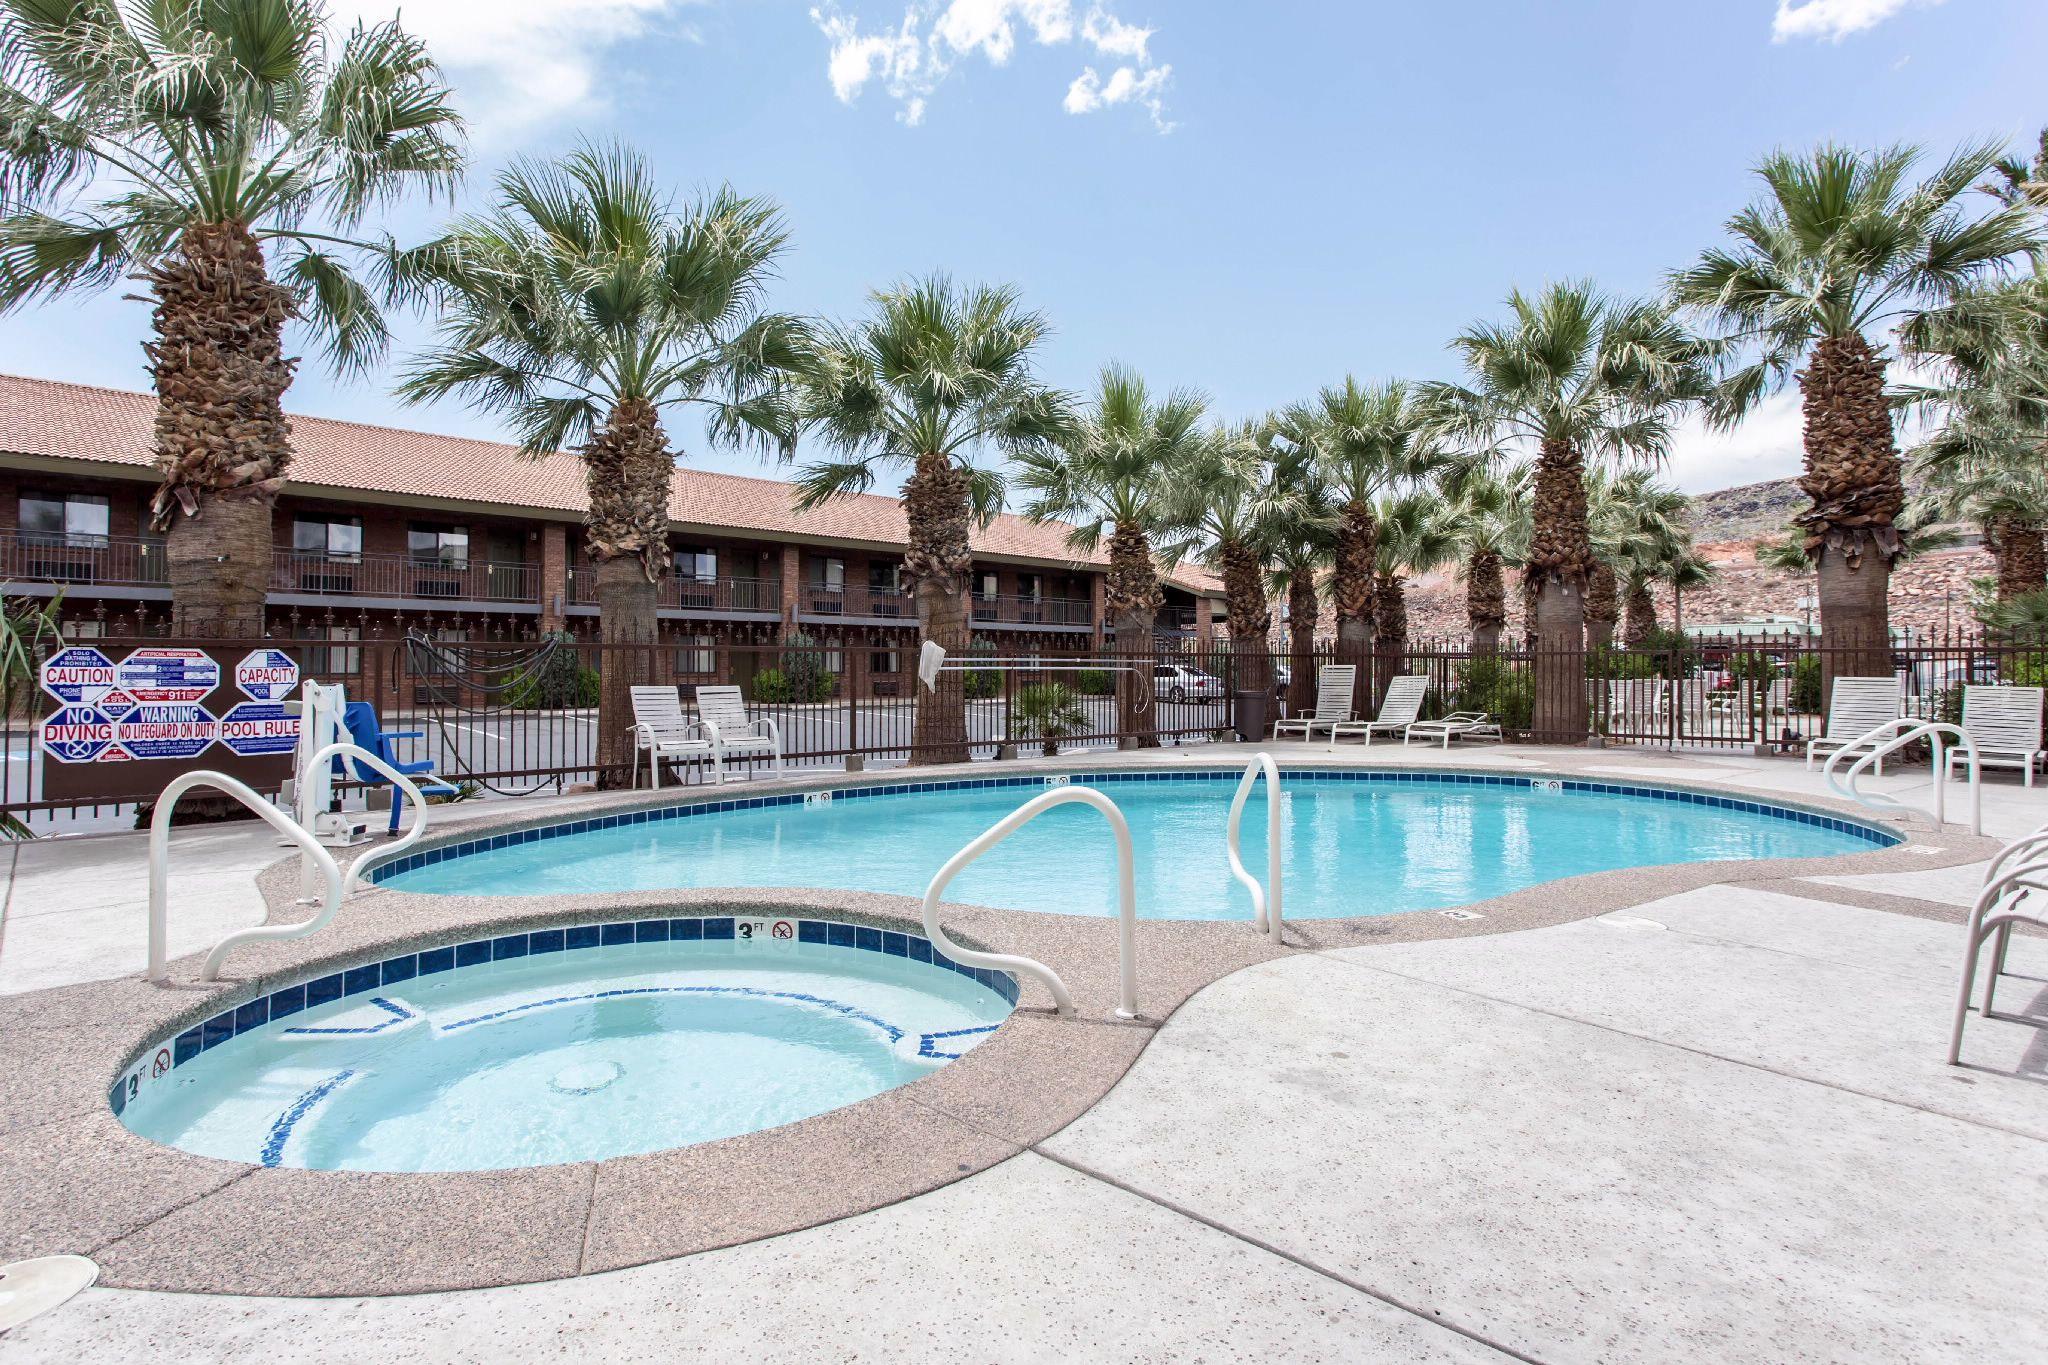 Outdoor Pool Quality Inn Saint George Ut Hotels Outdoor Pool